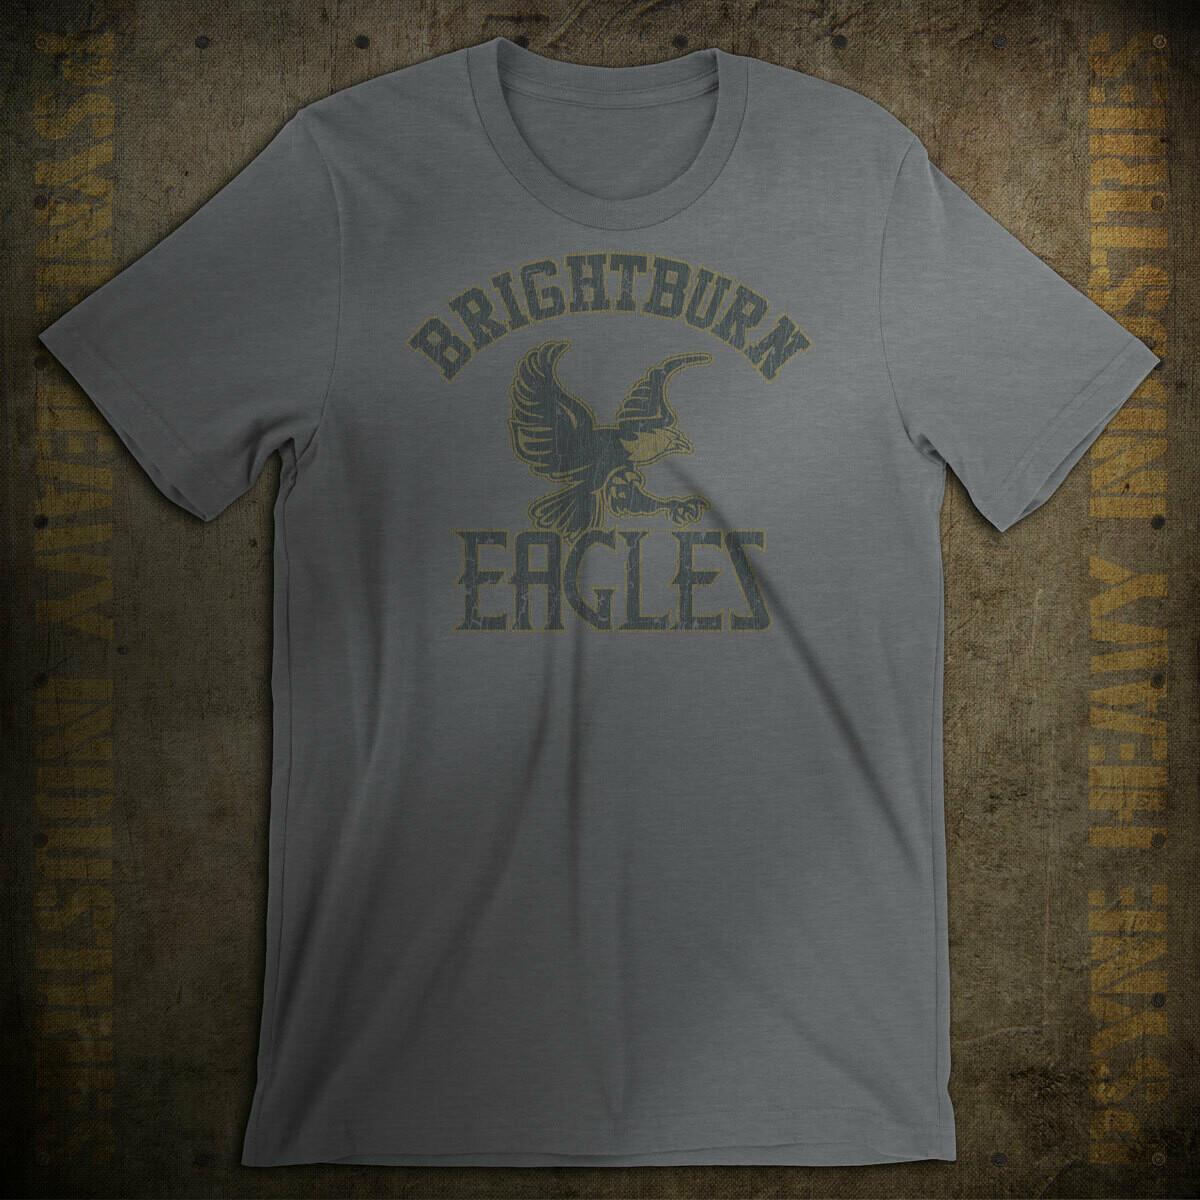 Brightburn Eagles Vintage Athletic T-Shirt